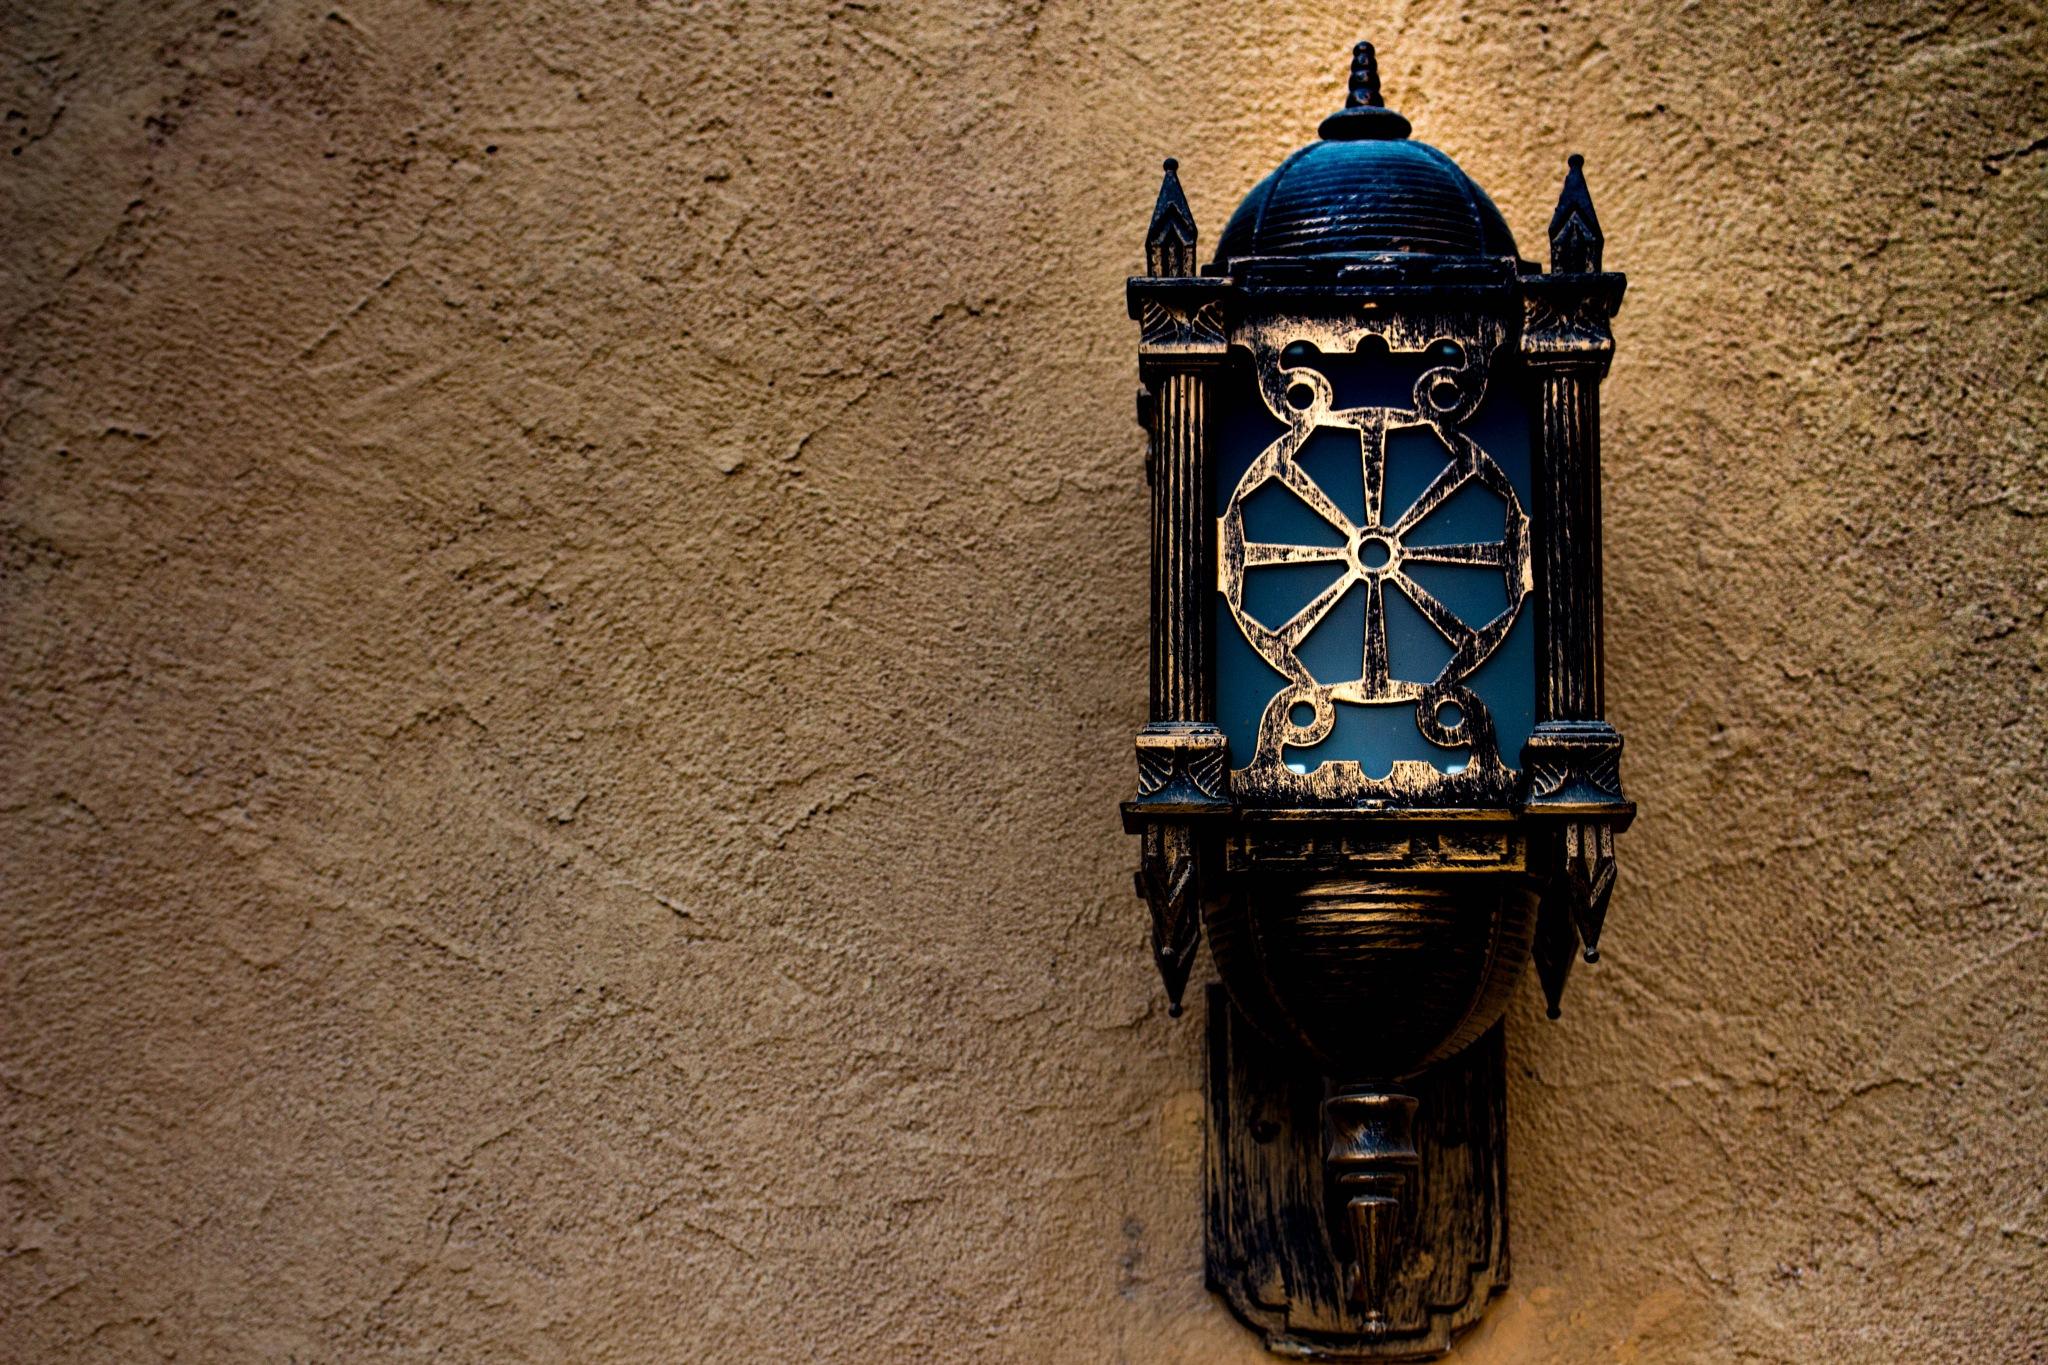 Old Lantern by Sonans